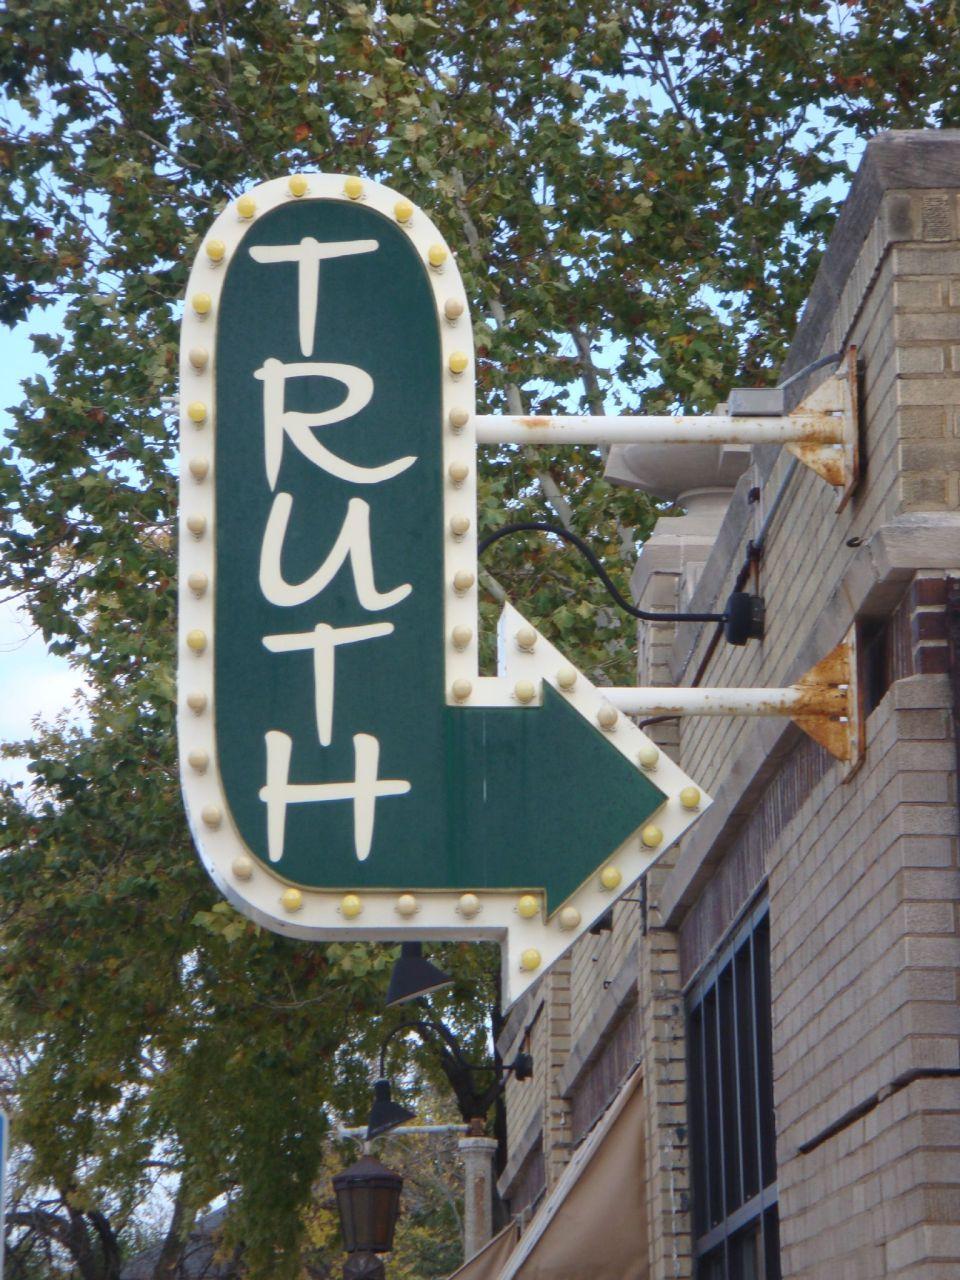 Truth Sign via loreshdw on Flickr -- CC